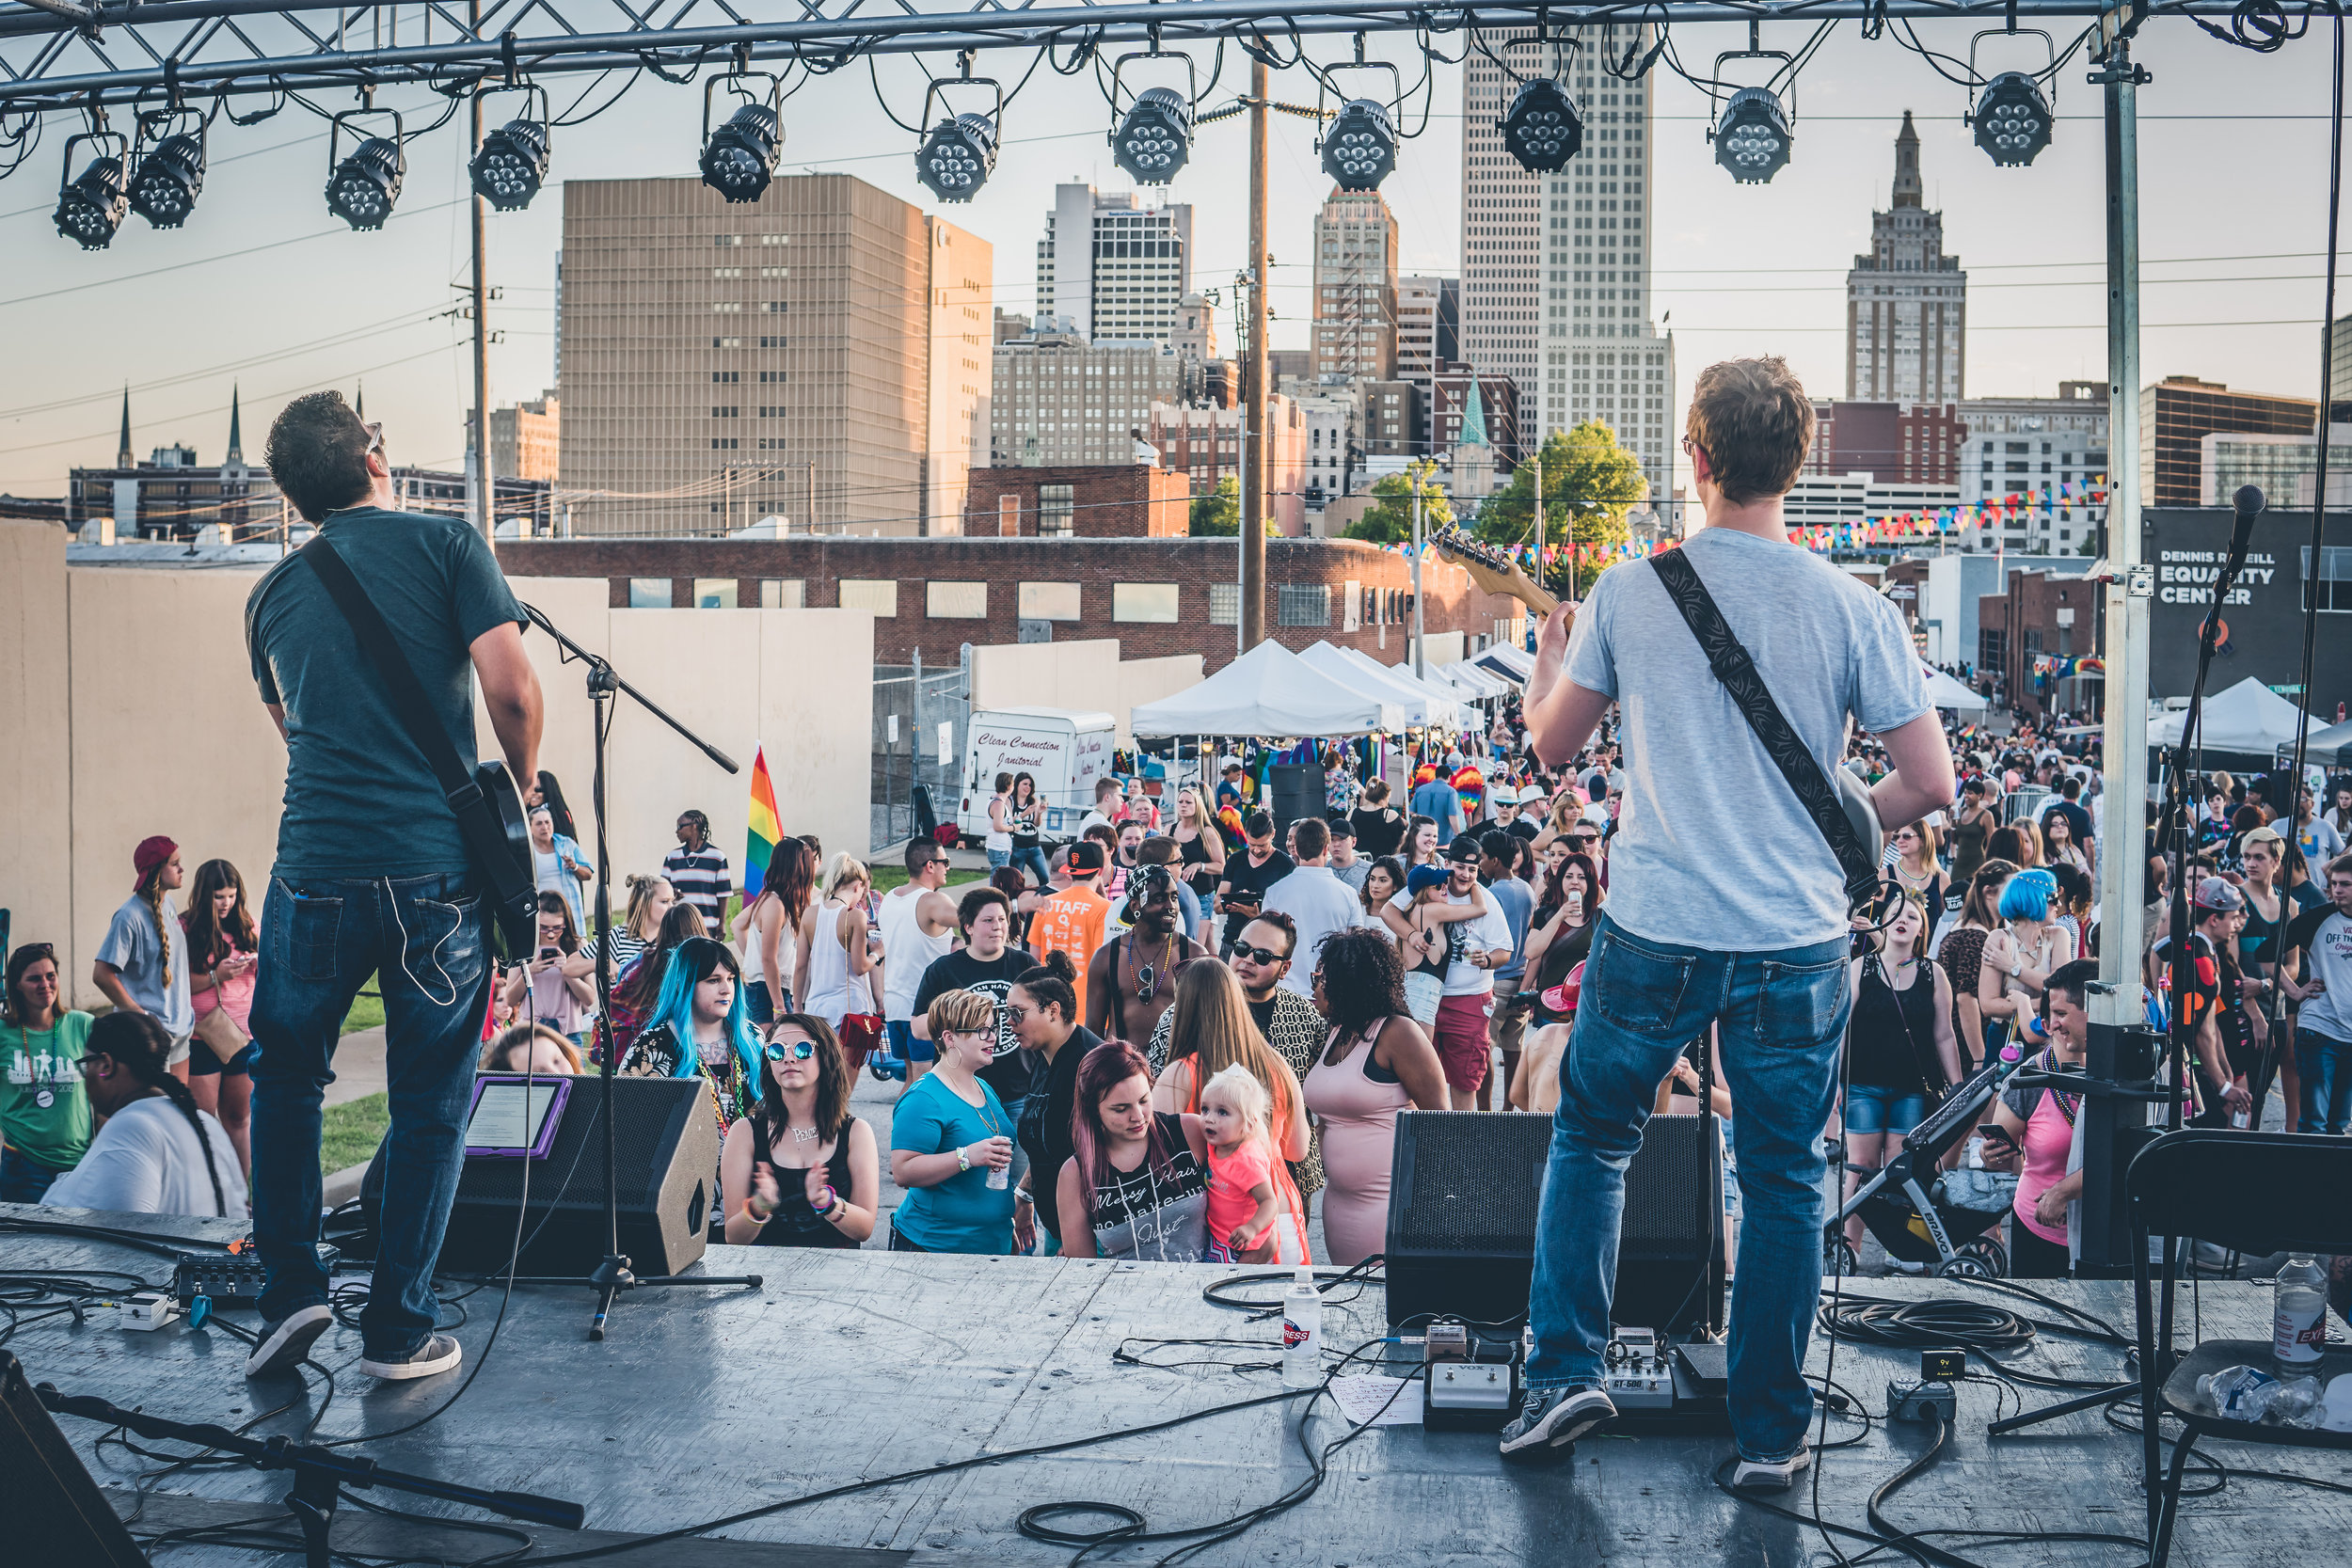 FM Pilots - Tulsa Rock Band - Tulsa Pride Fest Tulsa, OK 060416-10.jpg